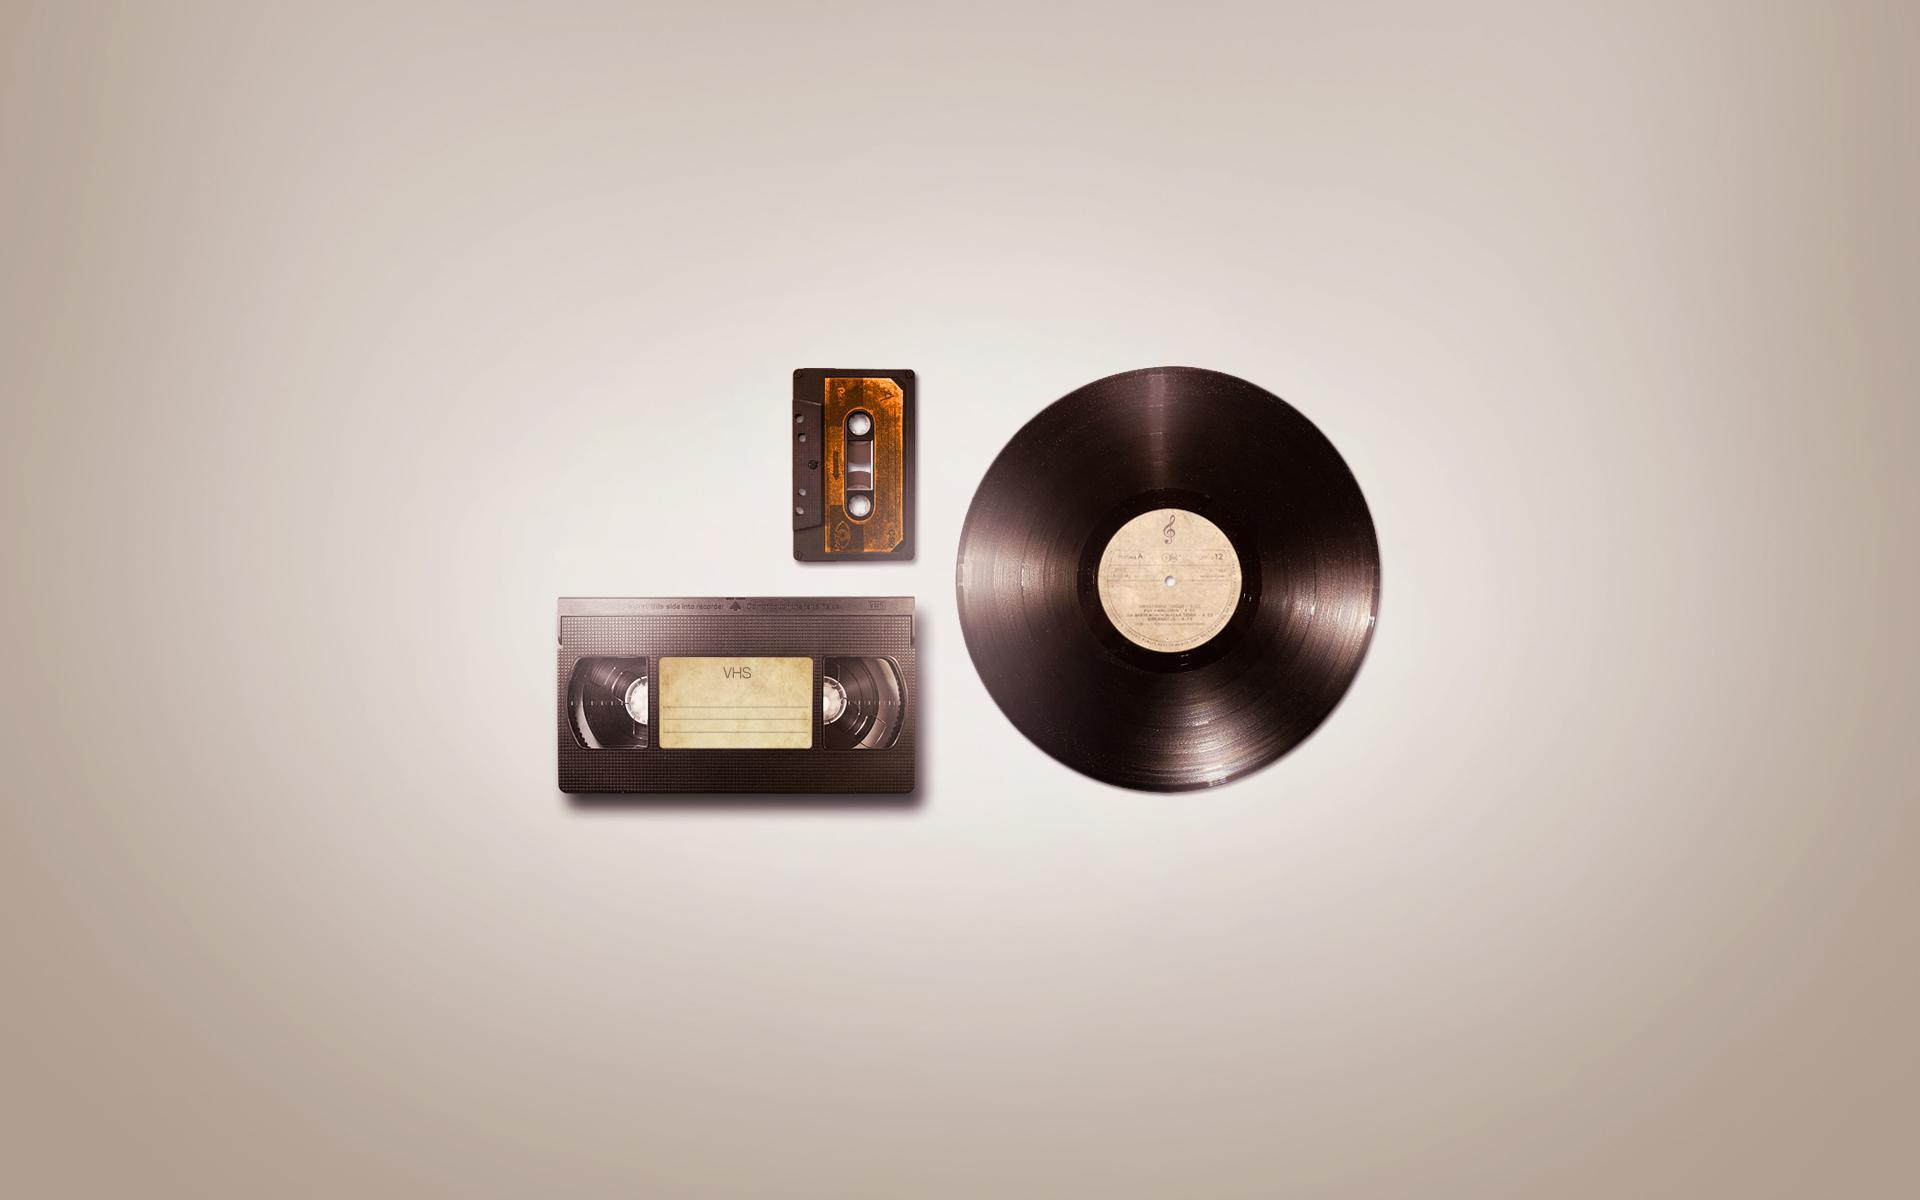 музыка касеты минимализм  № 3518151 бесплатно